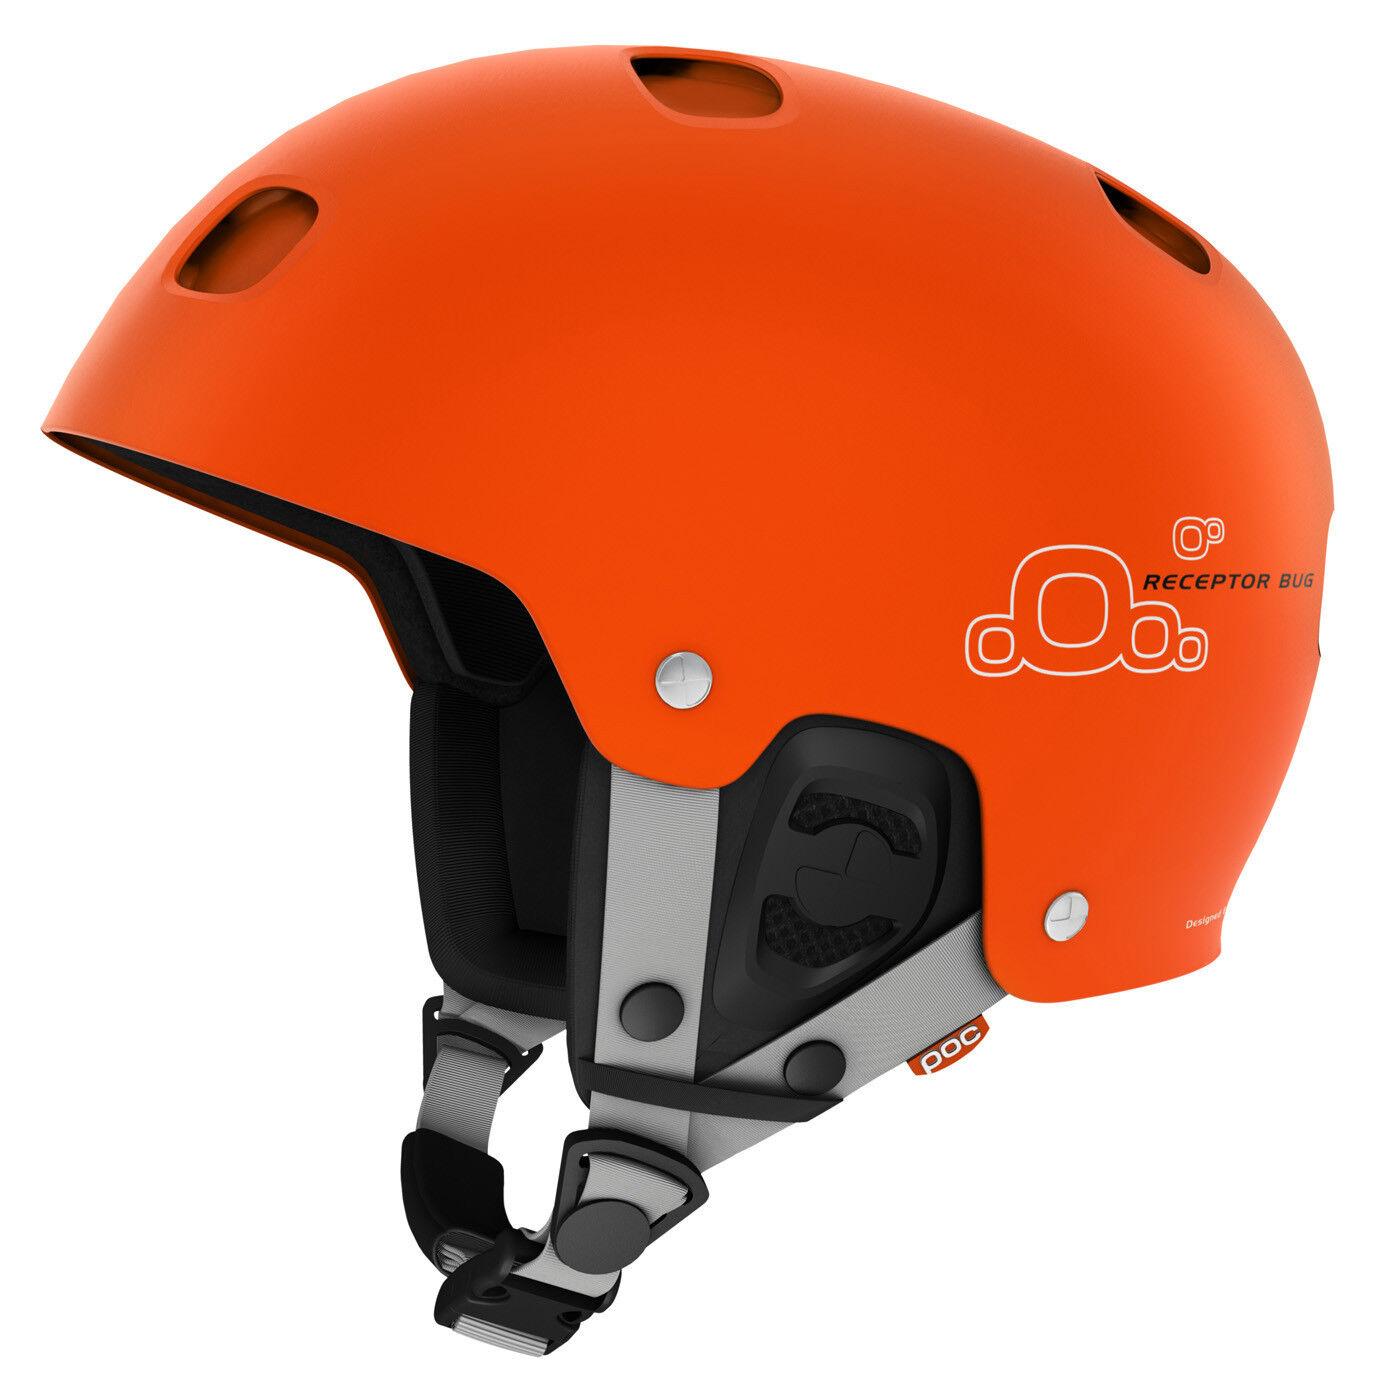 Poc Adult Receptor Bug Ski Skiing Snow Helmet Iron Orange Medium M 55 56 cm